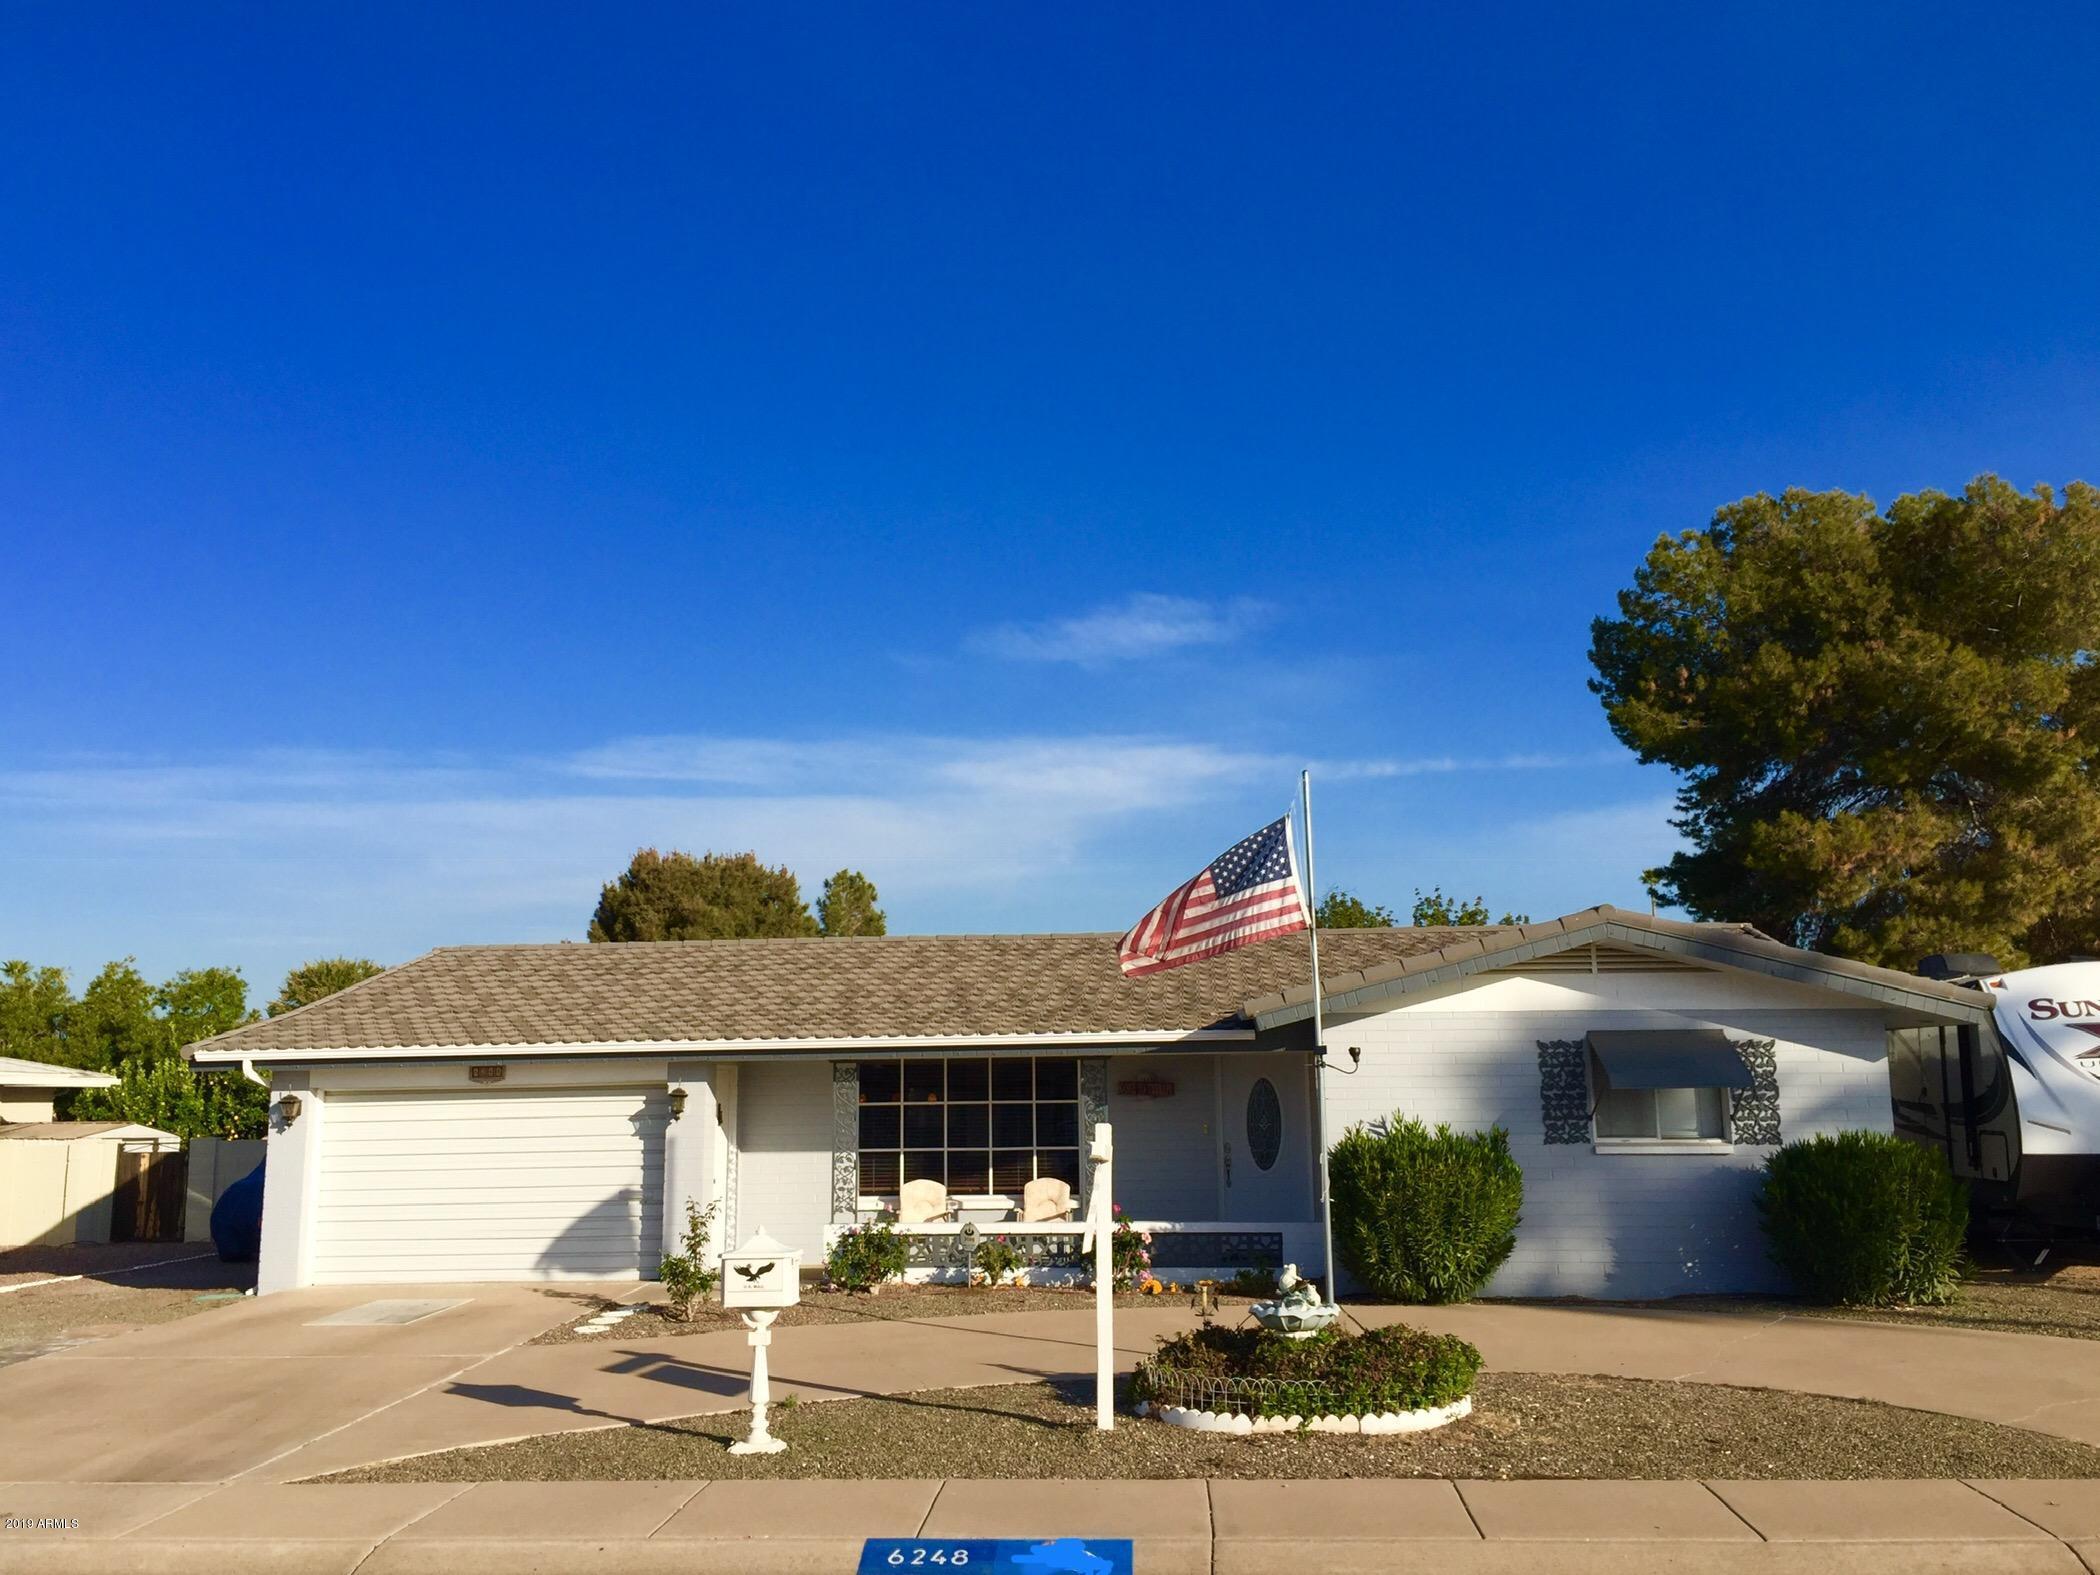 Photo of 6248 E DECATUR Street, Mesa, AZ 85205